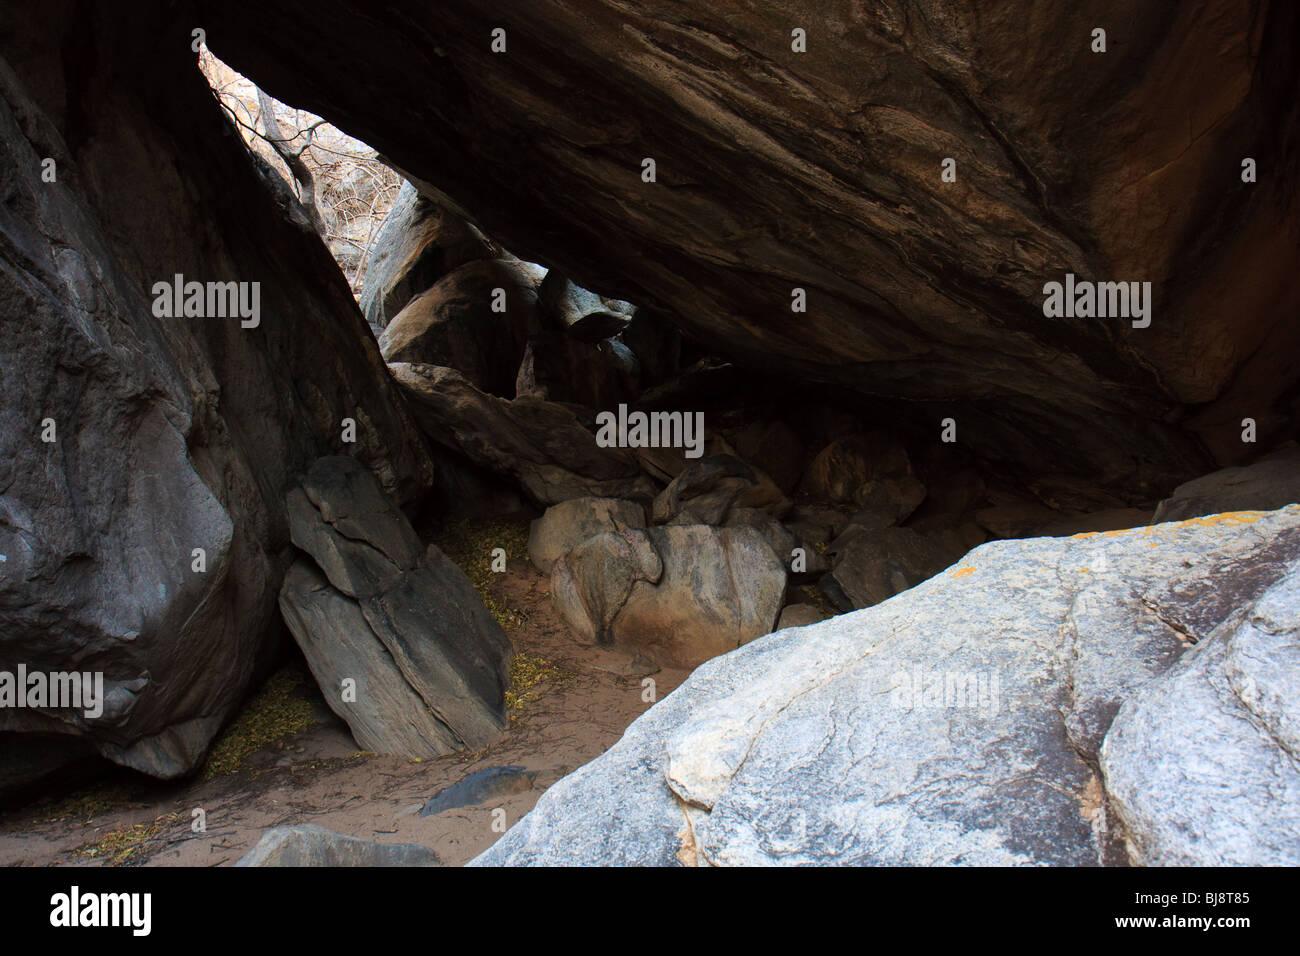 Africa Botswana Geometry Rocks Tsodilo Hills - Stock Image